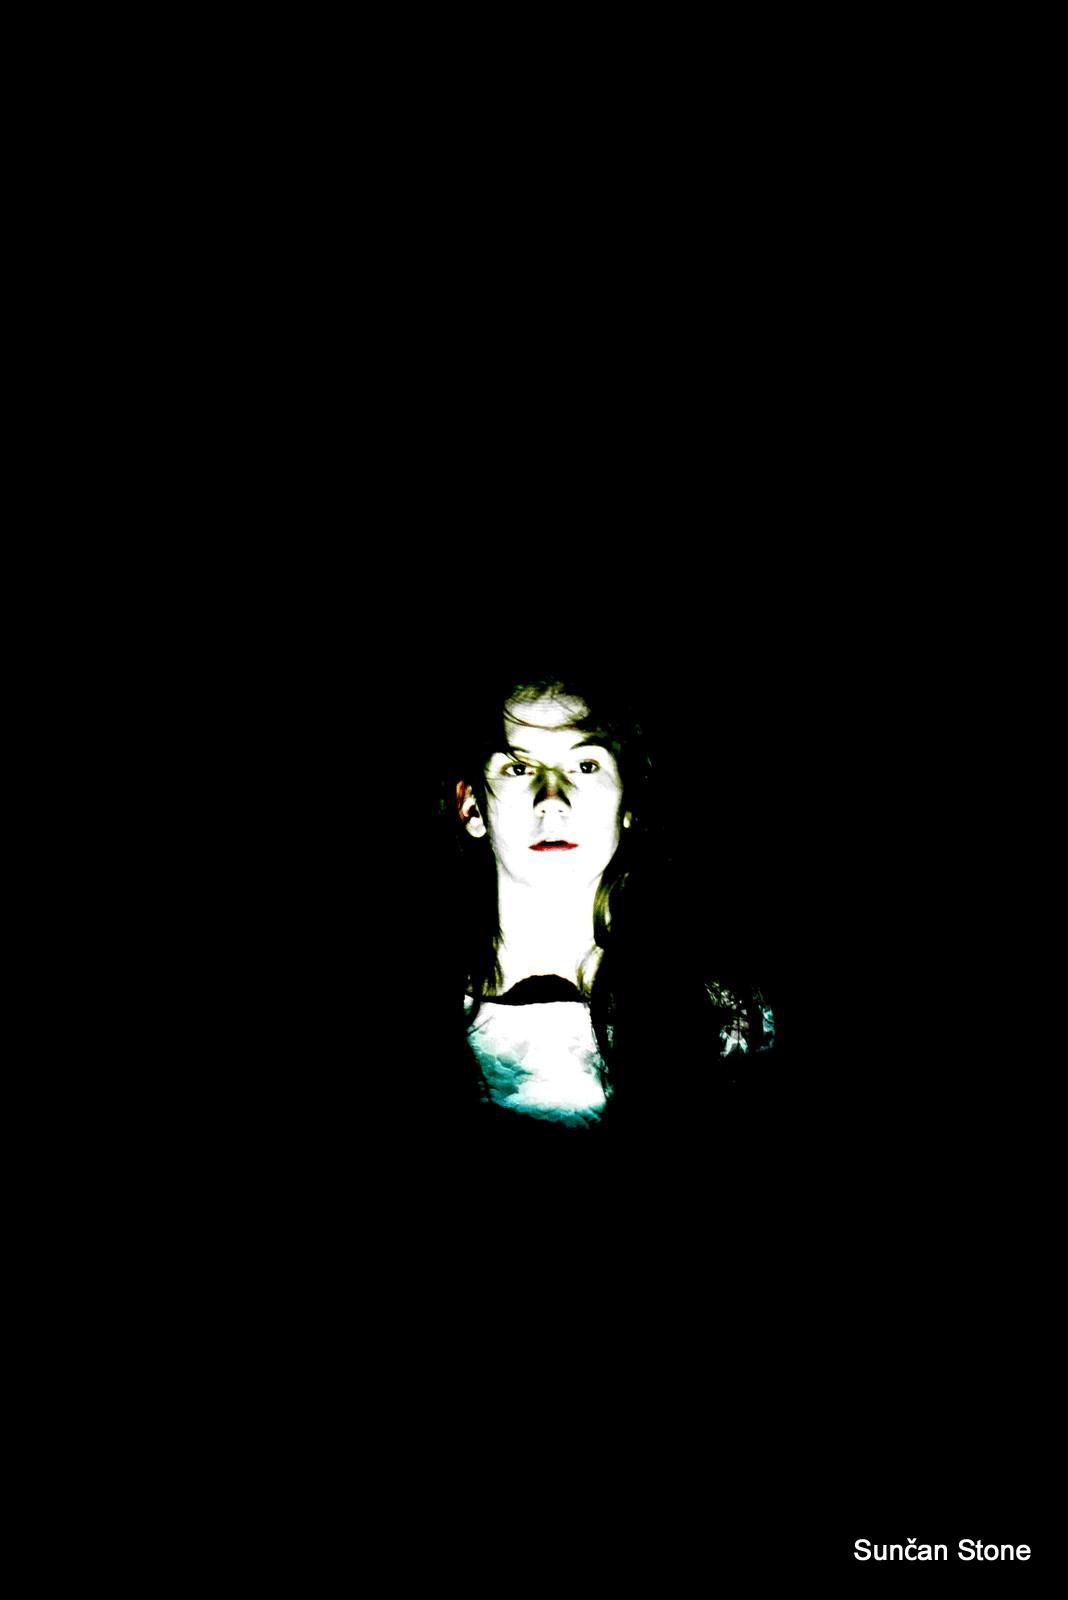 perf_nightlife_moderna_S_Anja-bride-face-indark-closeup_2015.png